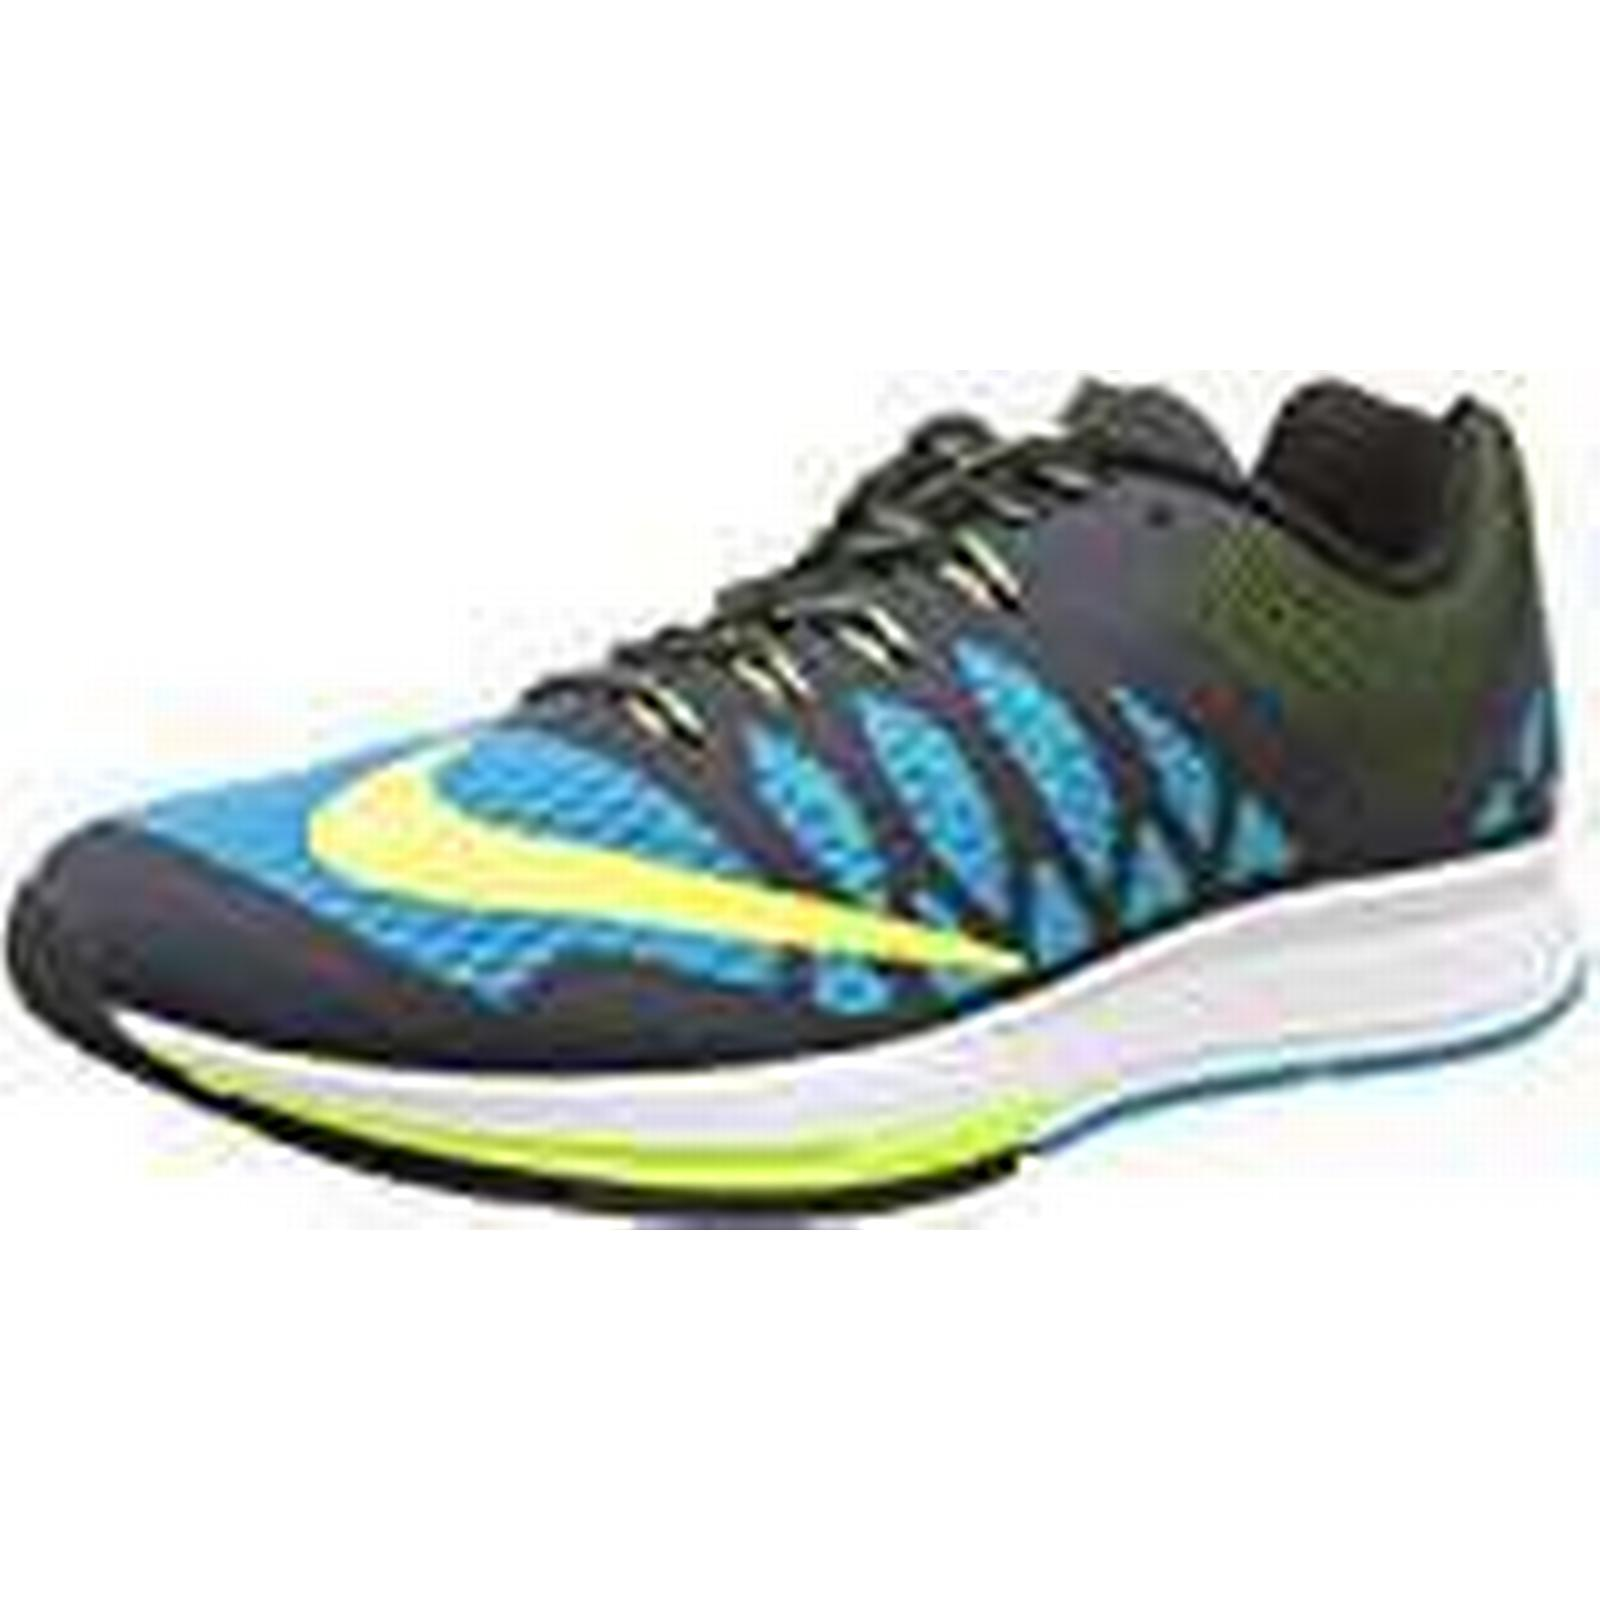 NIKE Air Zoom Elite 7, Men's Obsidian), Shoes, Multicolor (Blue Lagoon/Volt/Dark Obsidian), Men's 7.5 UK b04706